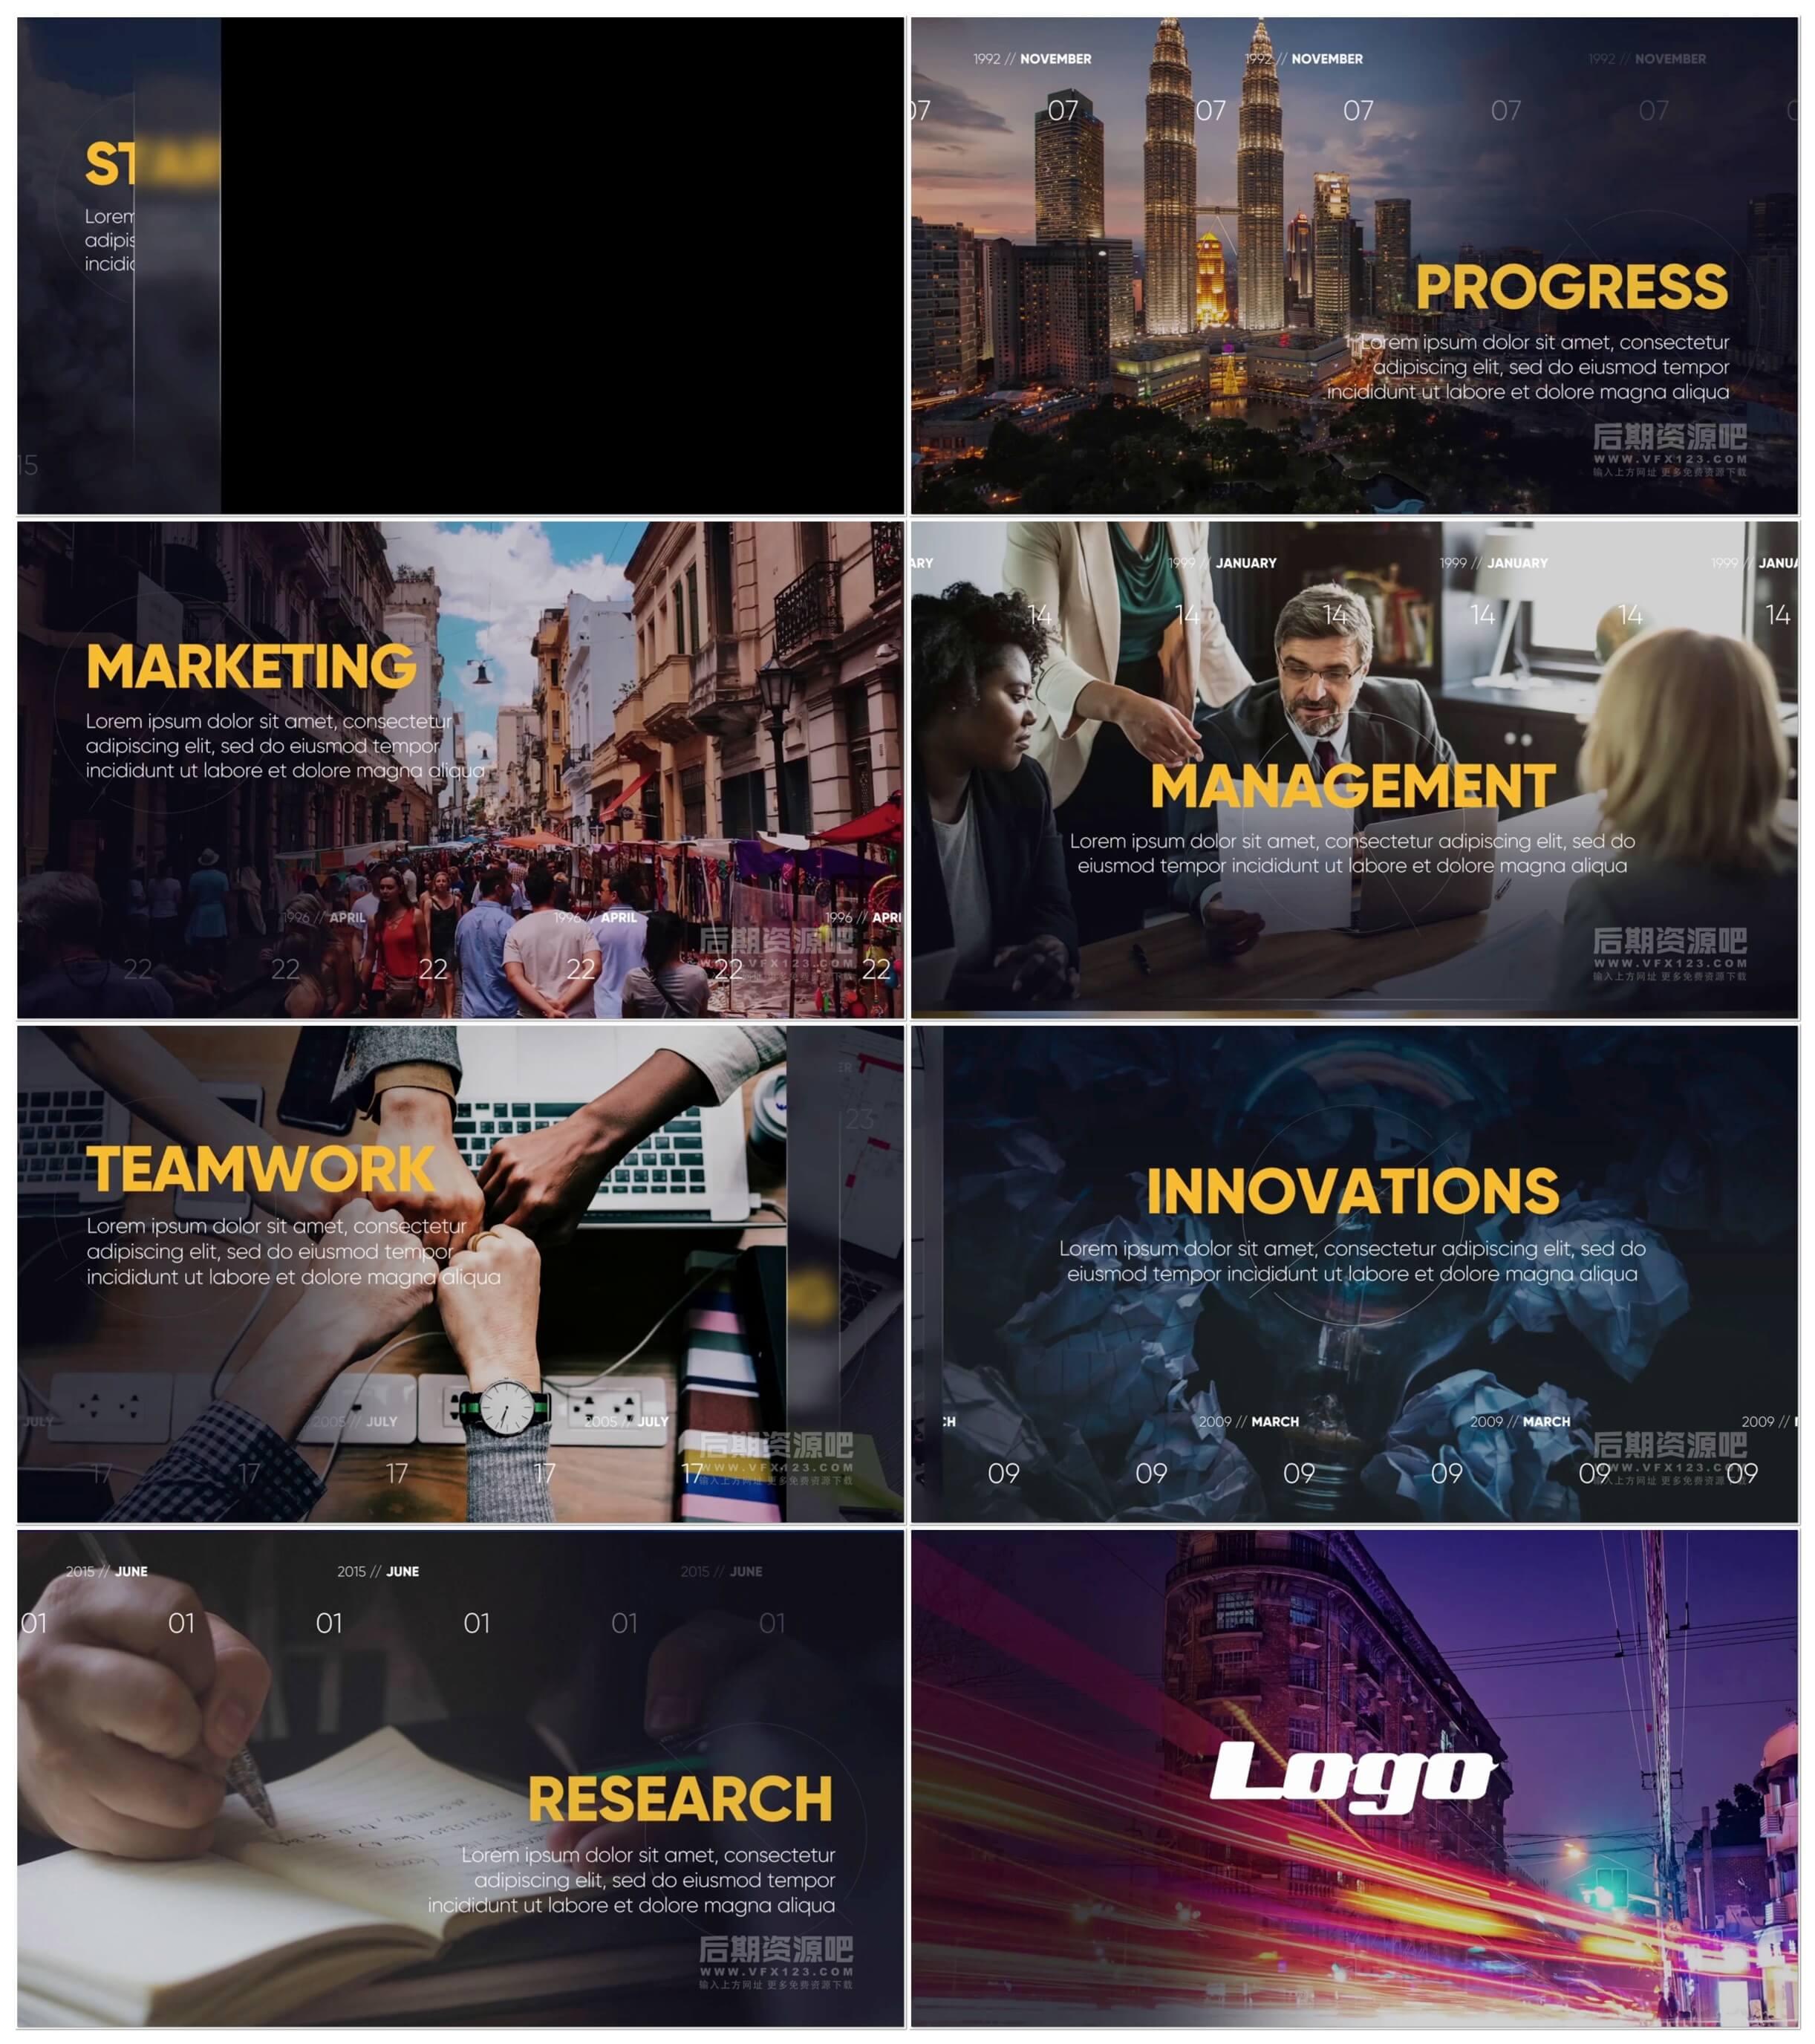 fcpx插件 企业公司发展历程宣传图文展示片头模板 Corporate Slideshow